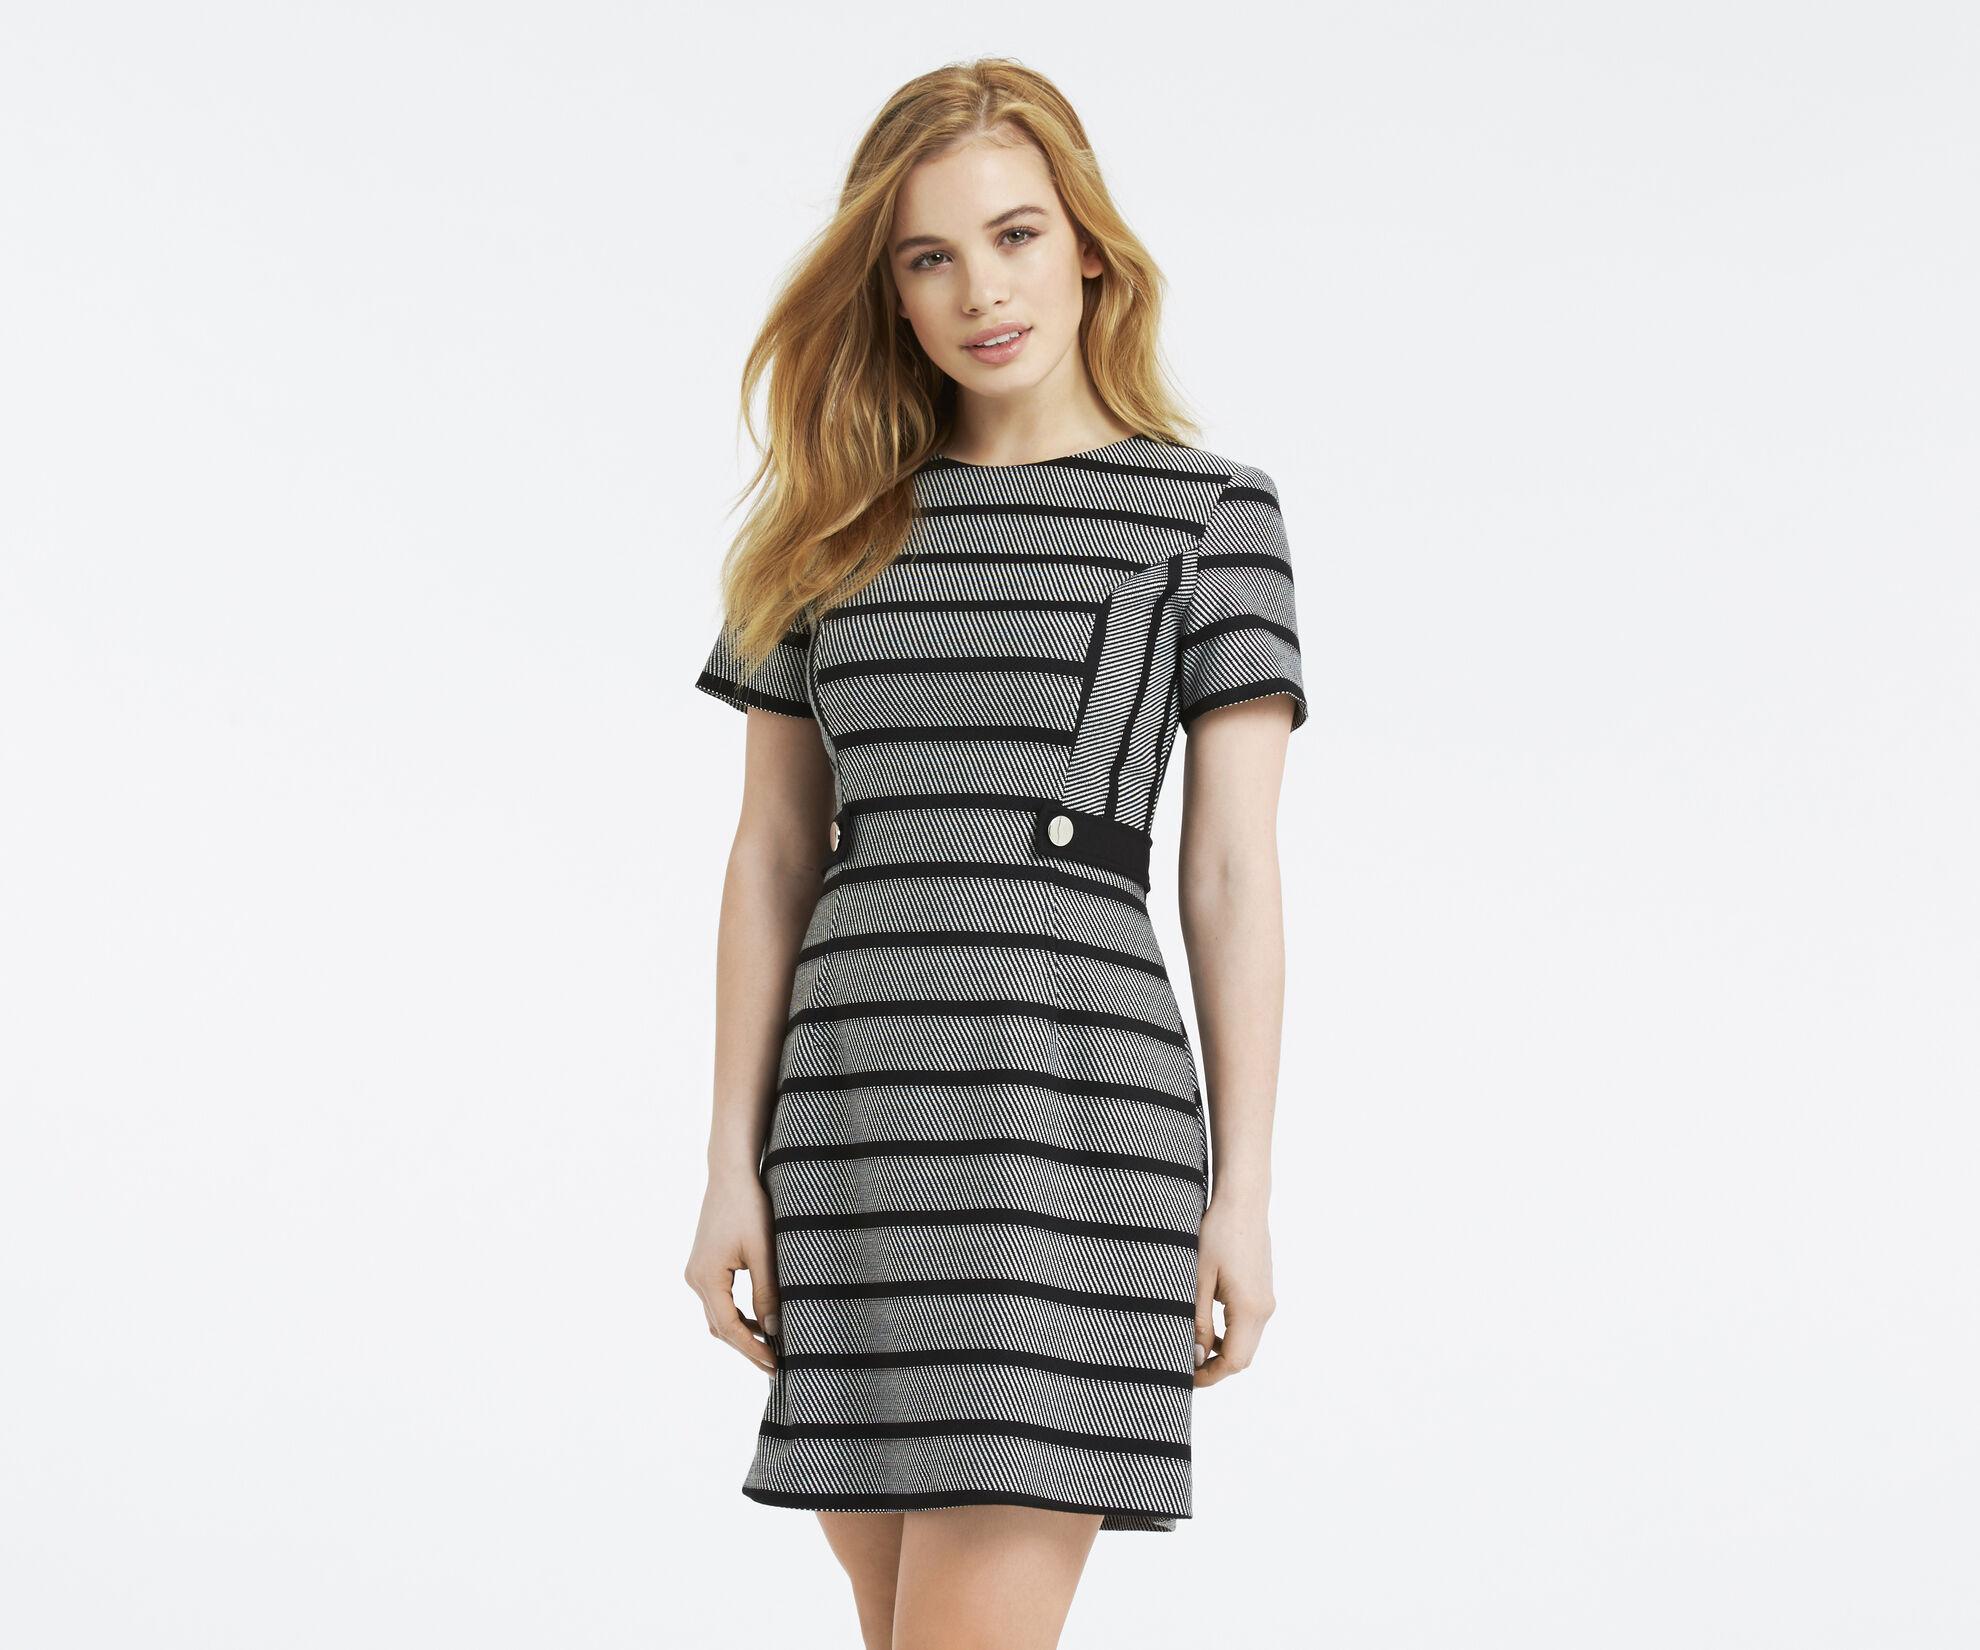 Oasis, Petite Stripe Shift Dress Black and White 1